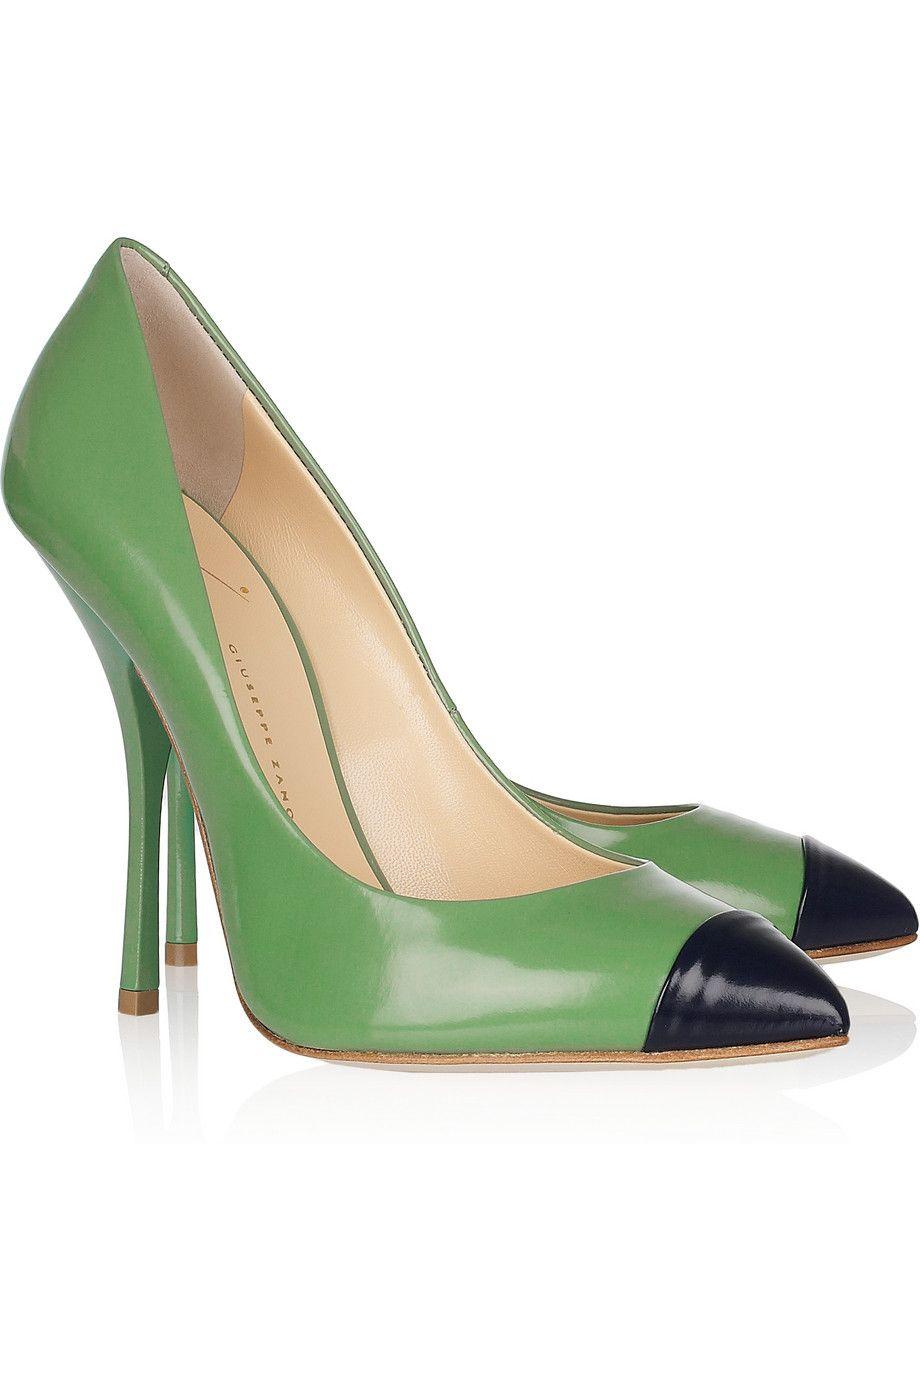 849bbf588a Giuseppe Zanotti - Two-tone glossed-leather pumps | Walk me. | Shoes ...